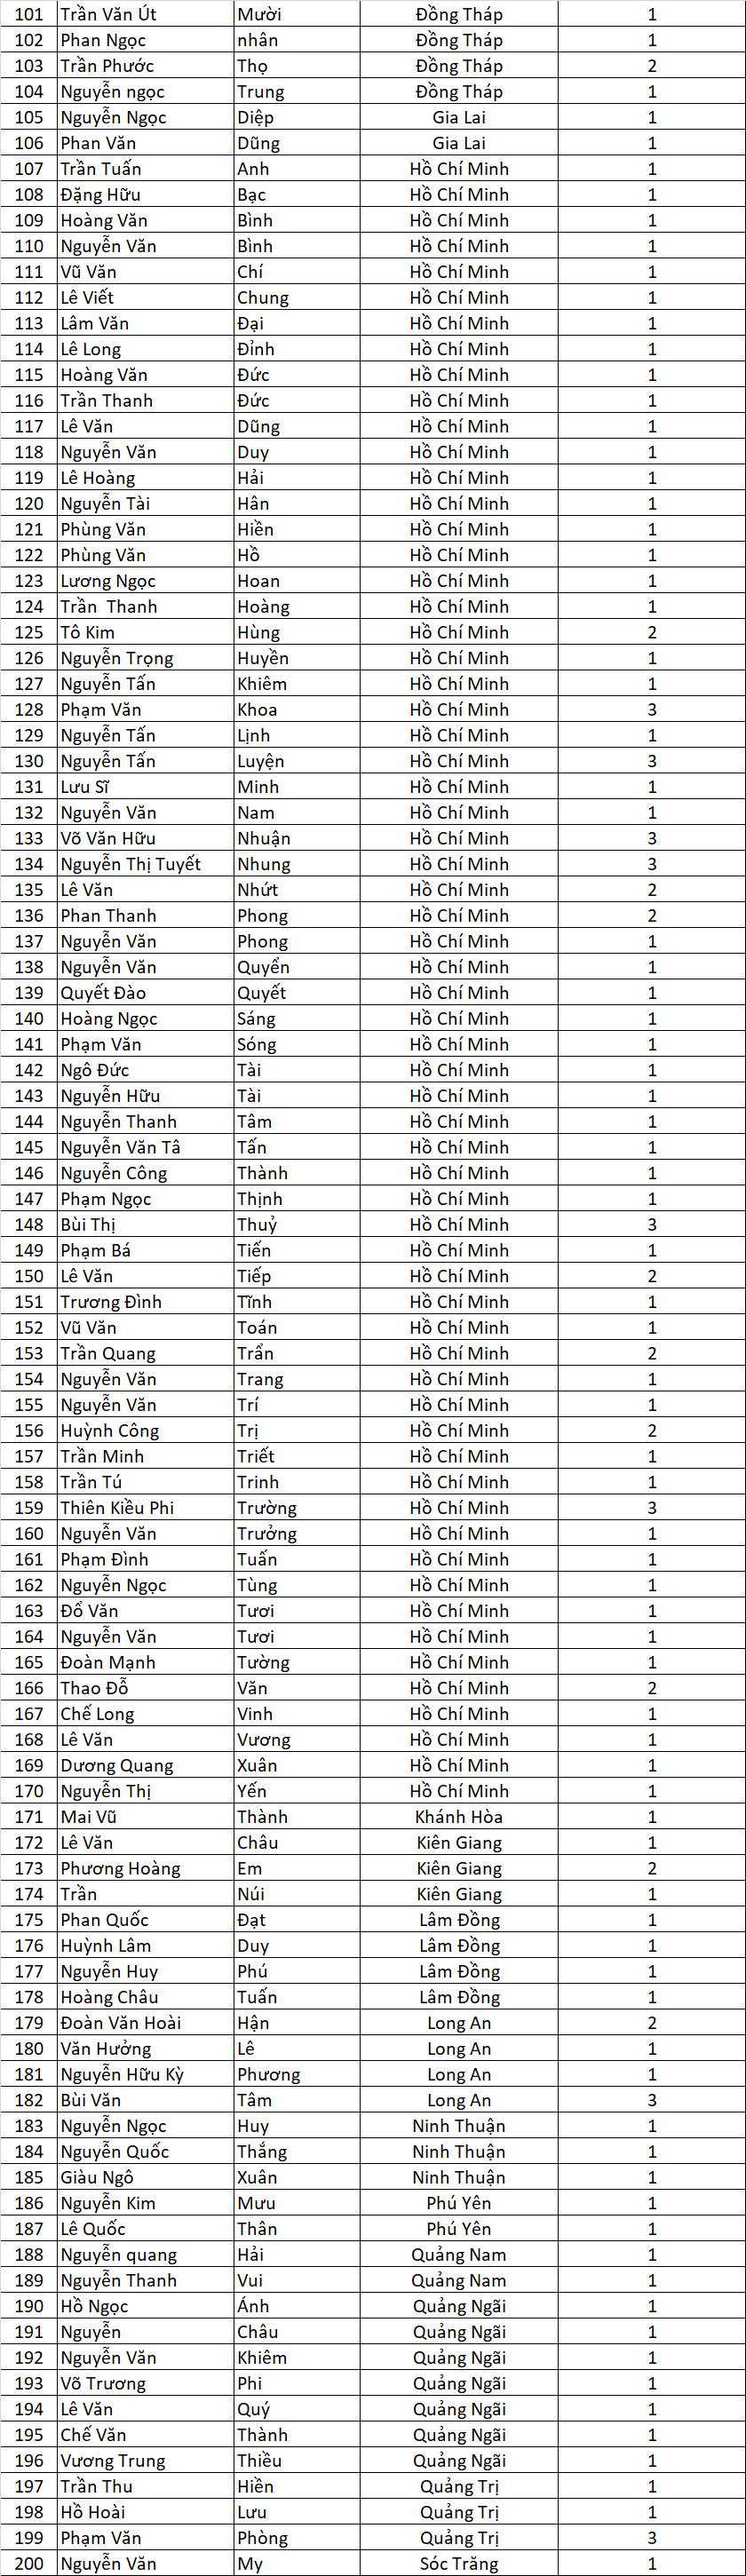 Danh sach ctkm TVSB dot 2